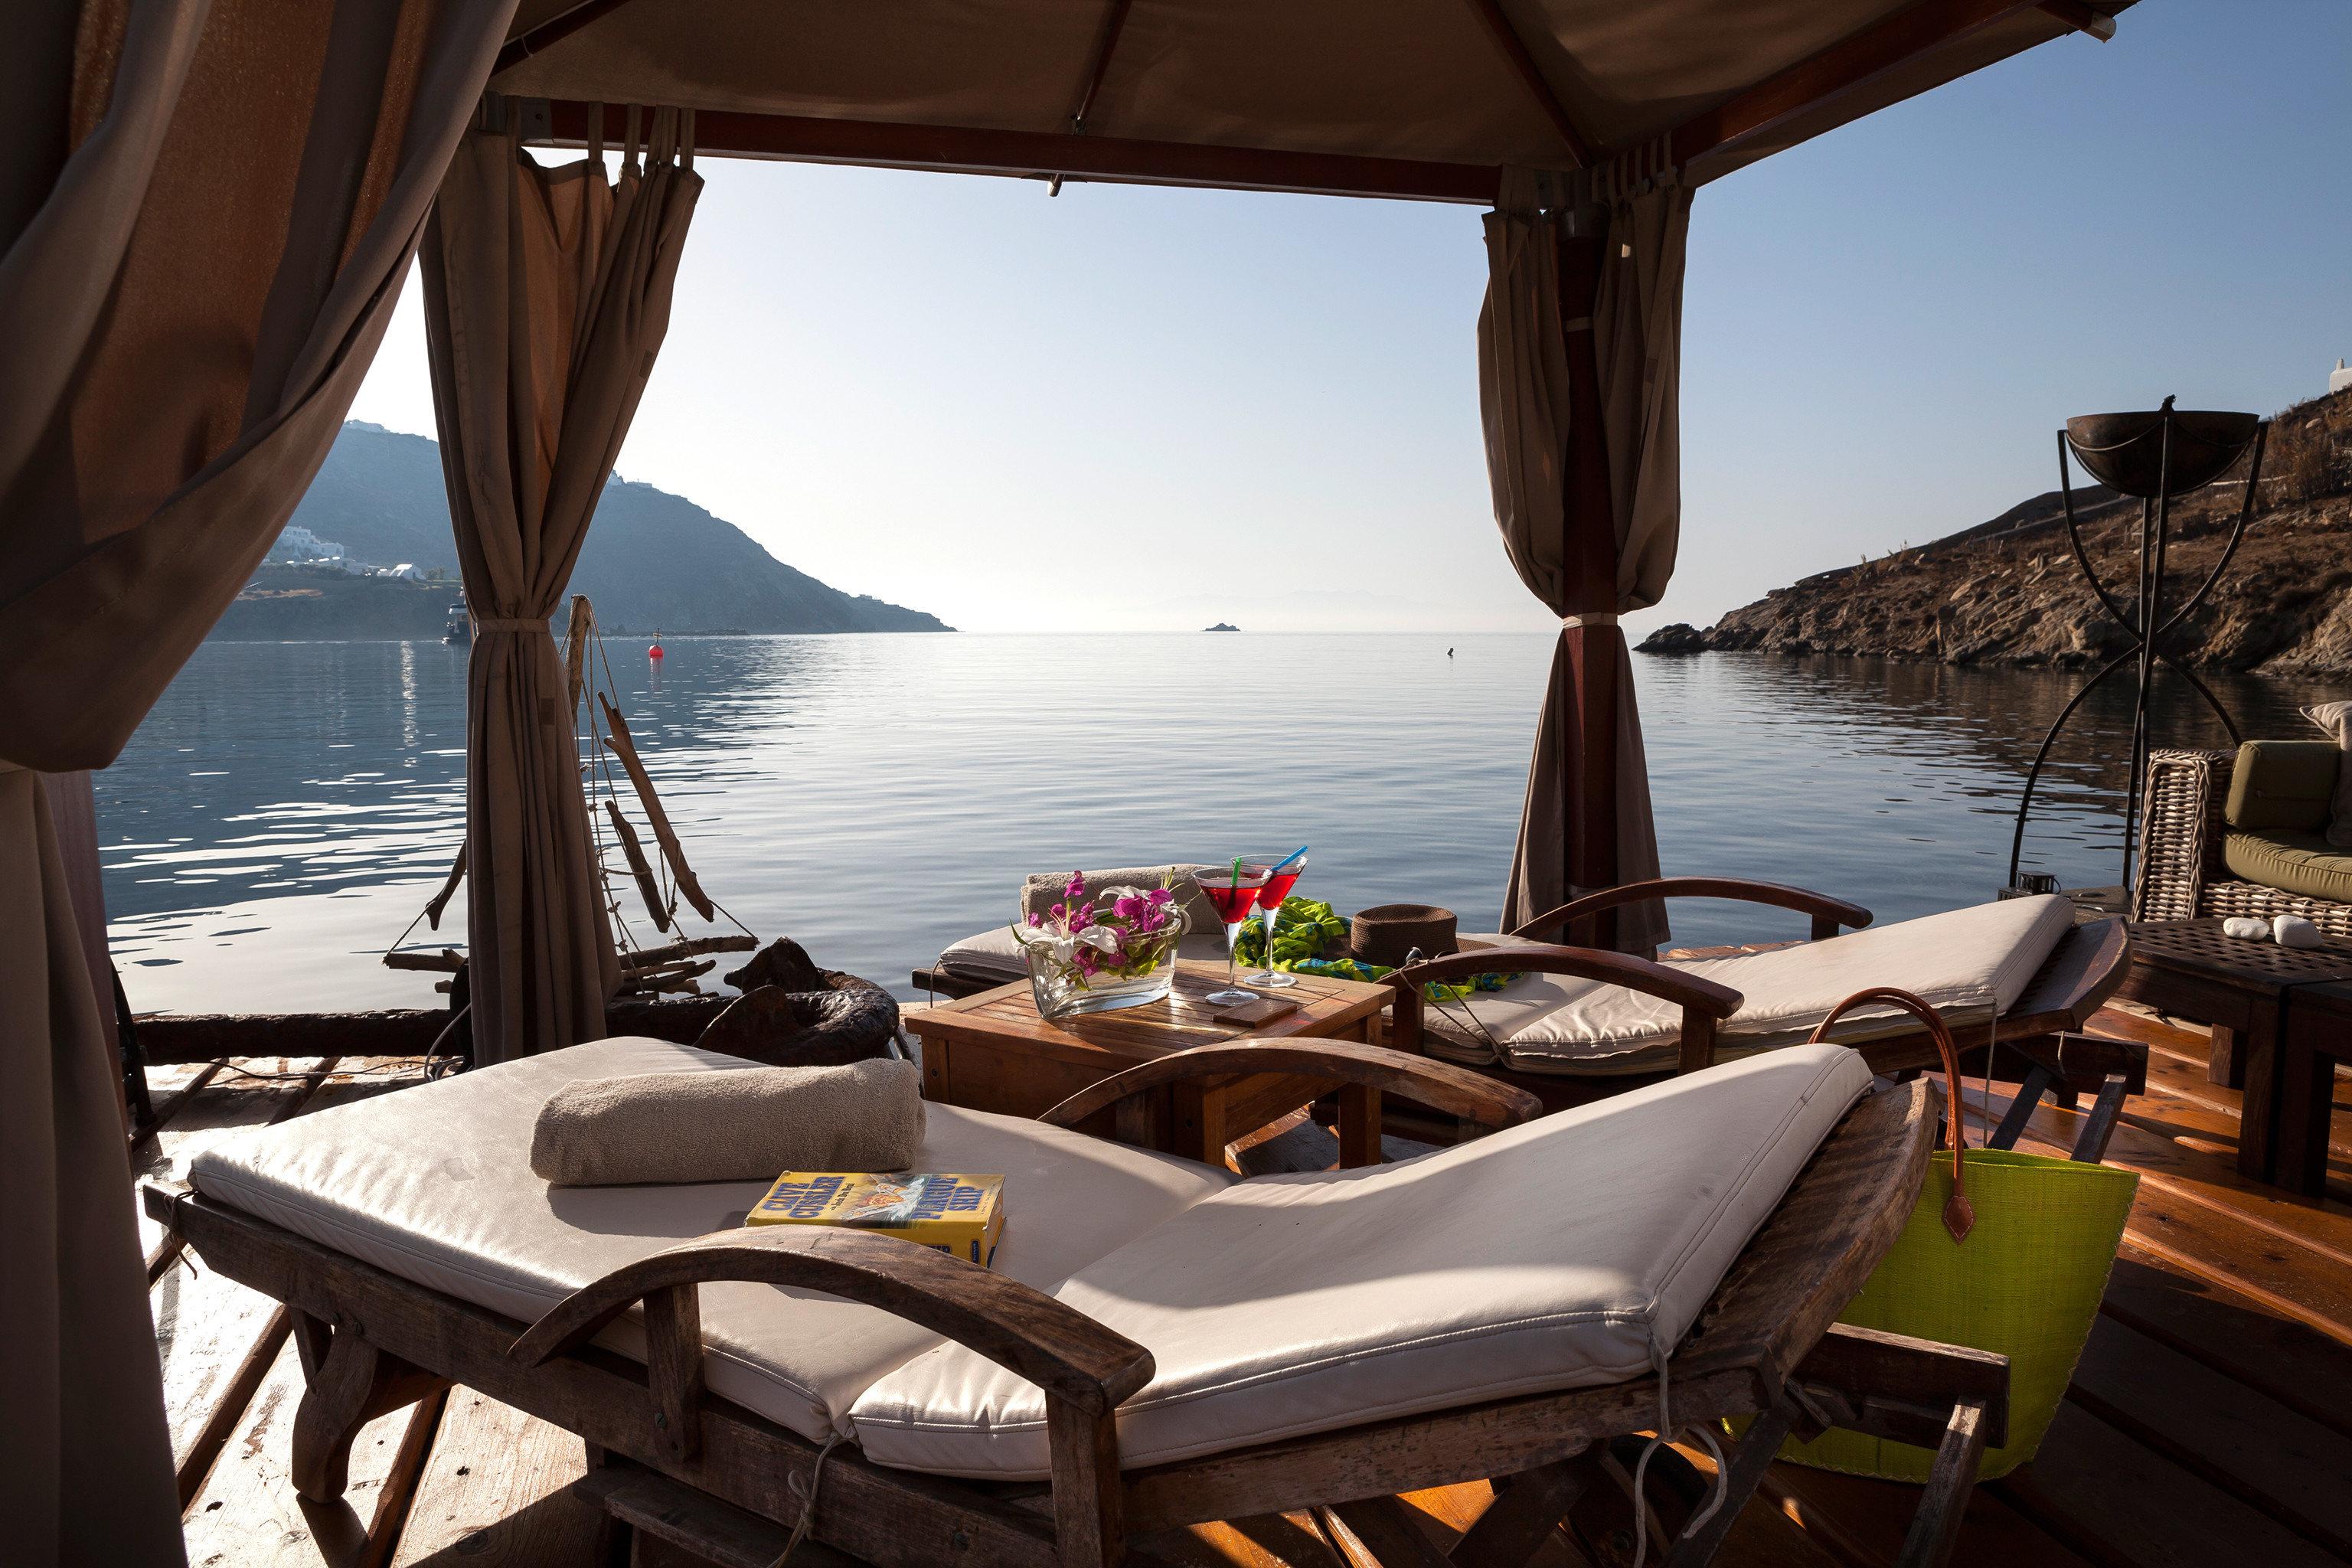 Beachfront Hip Lounge Luxury Modern sky chair Boat vehicle yacht passenger ship Sea travel overlooking set day